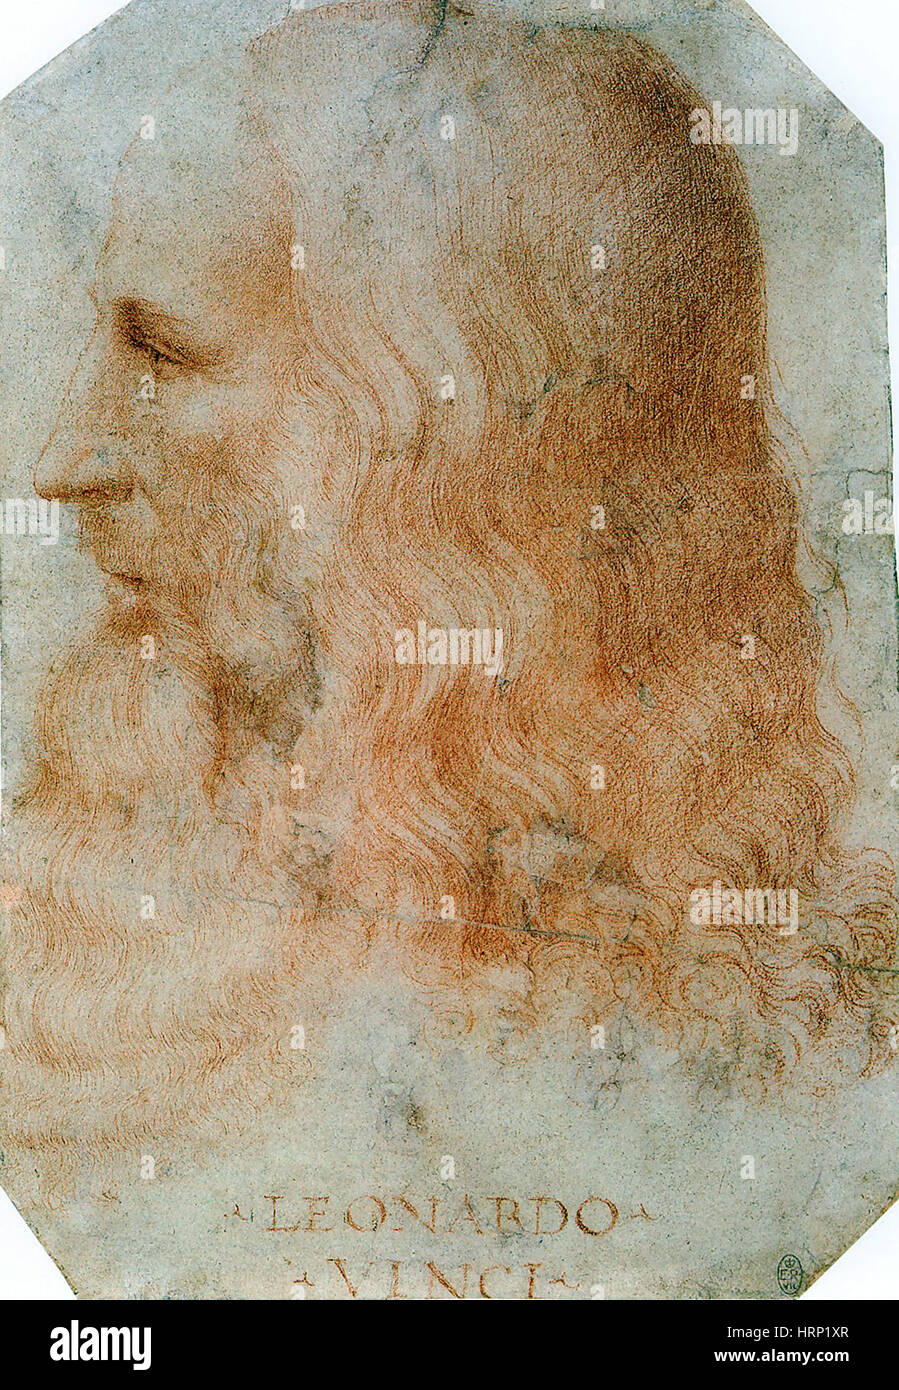 Leonardo da Vinci, el polímata renacentista italiano Imagen De Stock